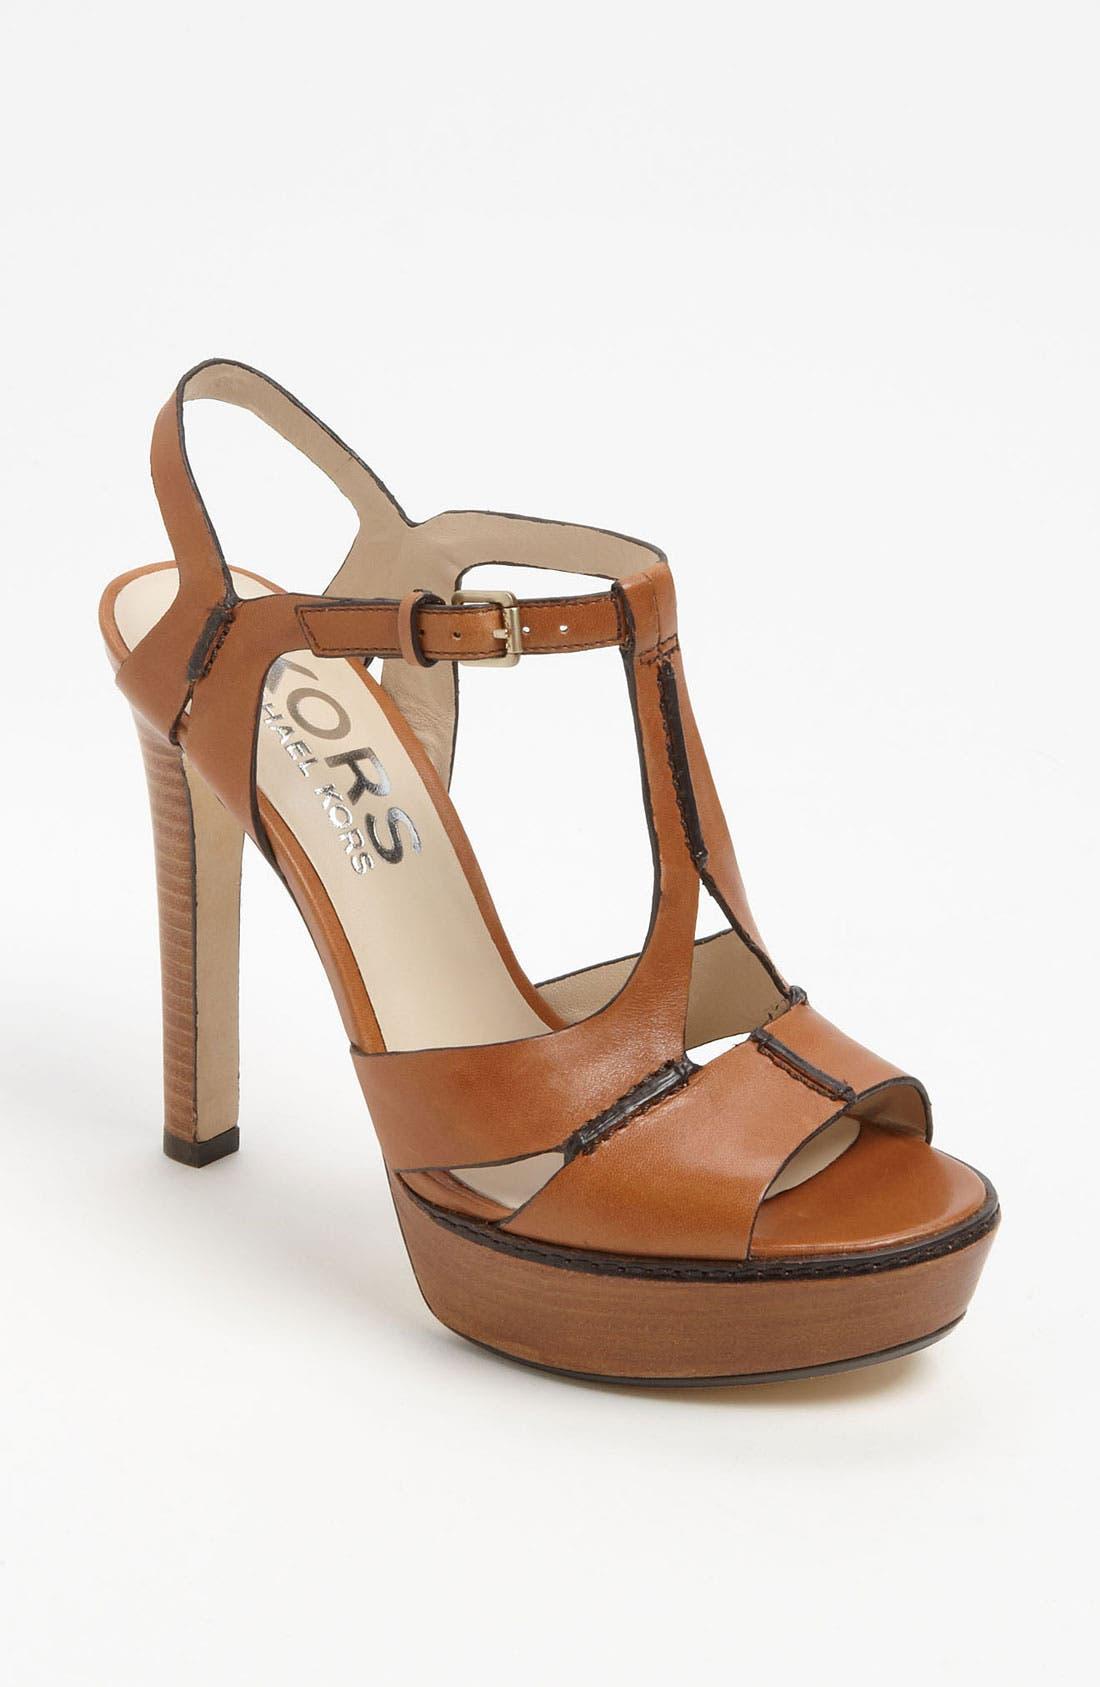 Alternate Image 1 Selected - KORS Michael Kors 'Brookton' Sandal